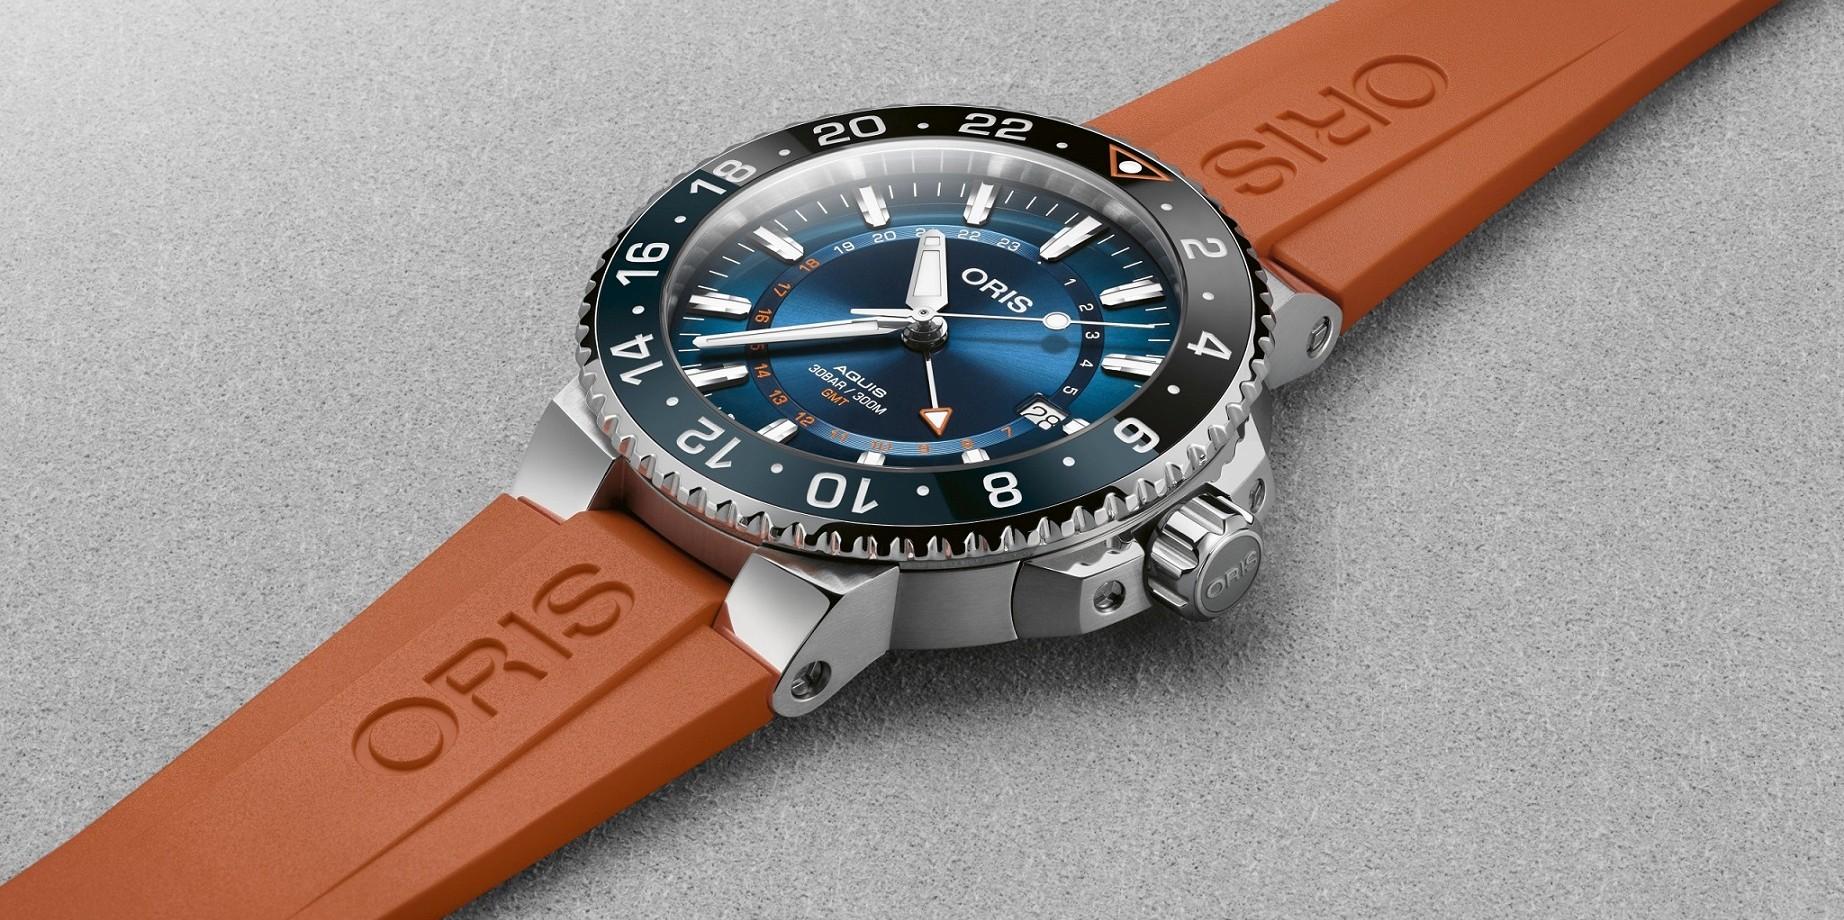 ORIS愛護海洋,義助復育珊湖礁,推出 Aquis Carysfort Reef 卡里斯福特礁限量腕錶